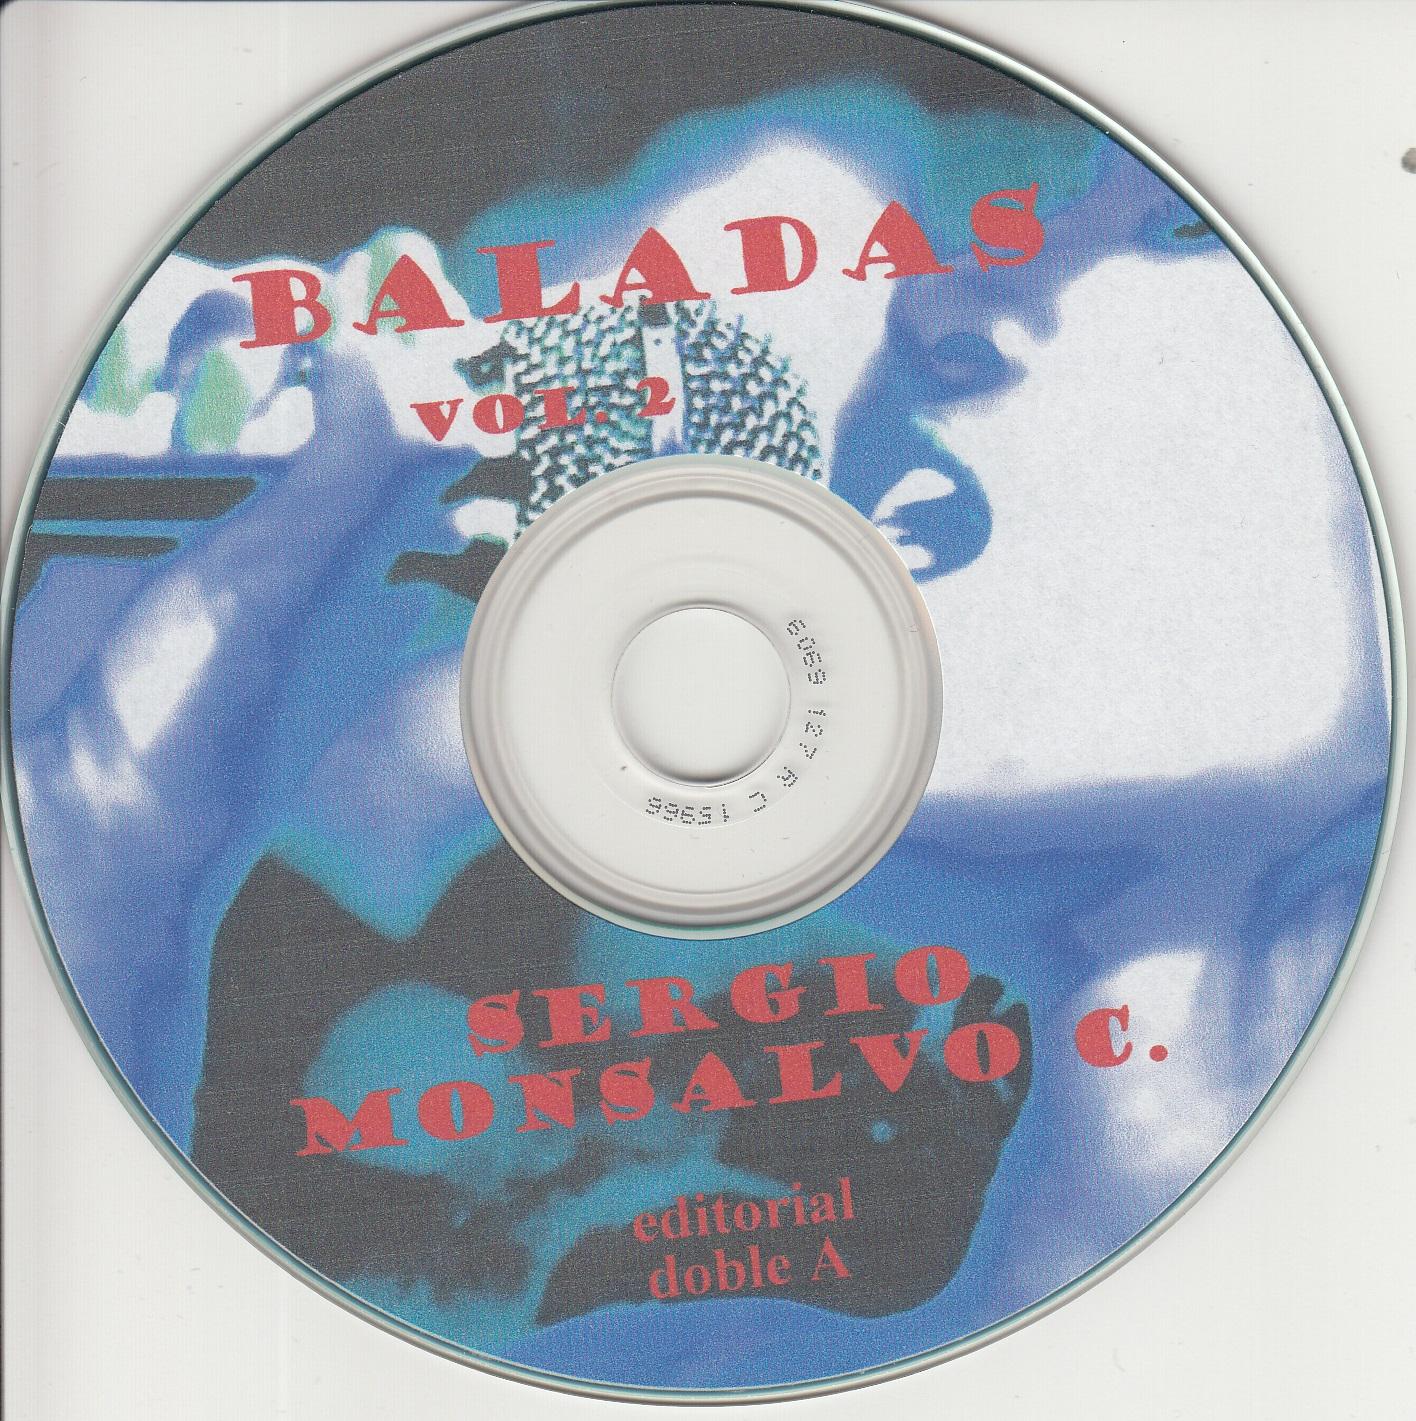 BALADAS VOL. 2 (FOTO 2)